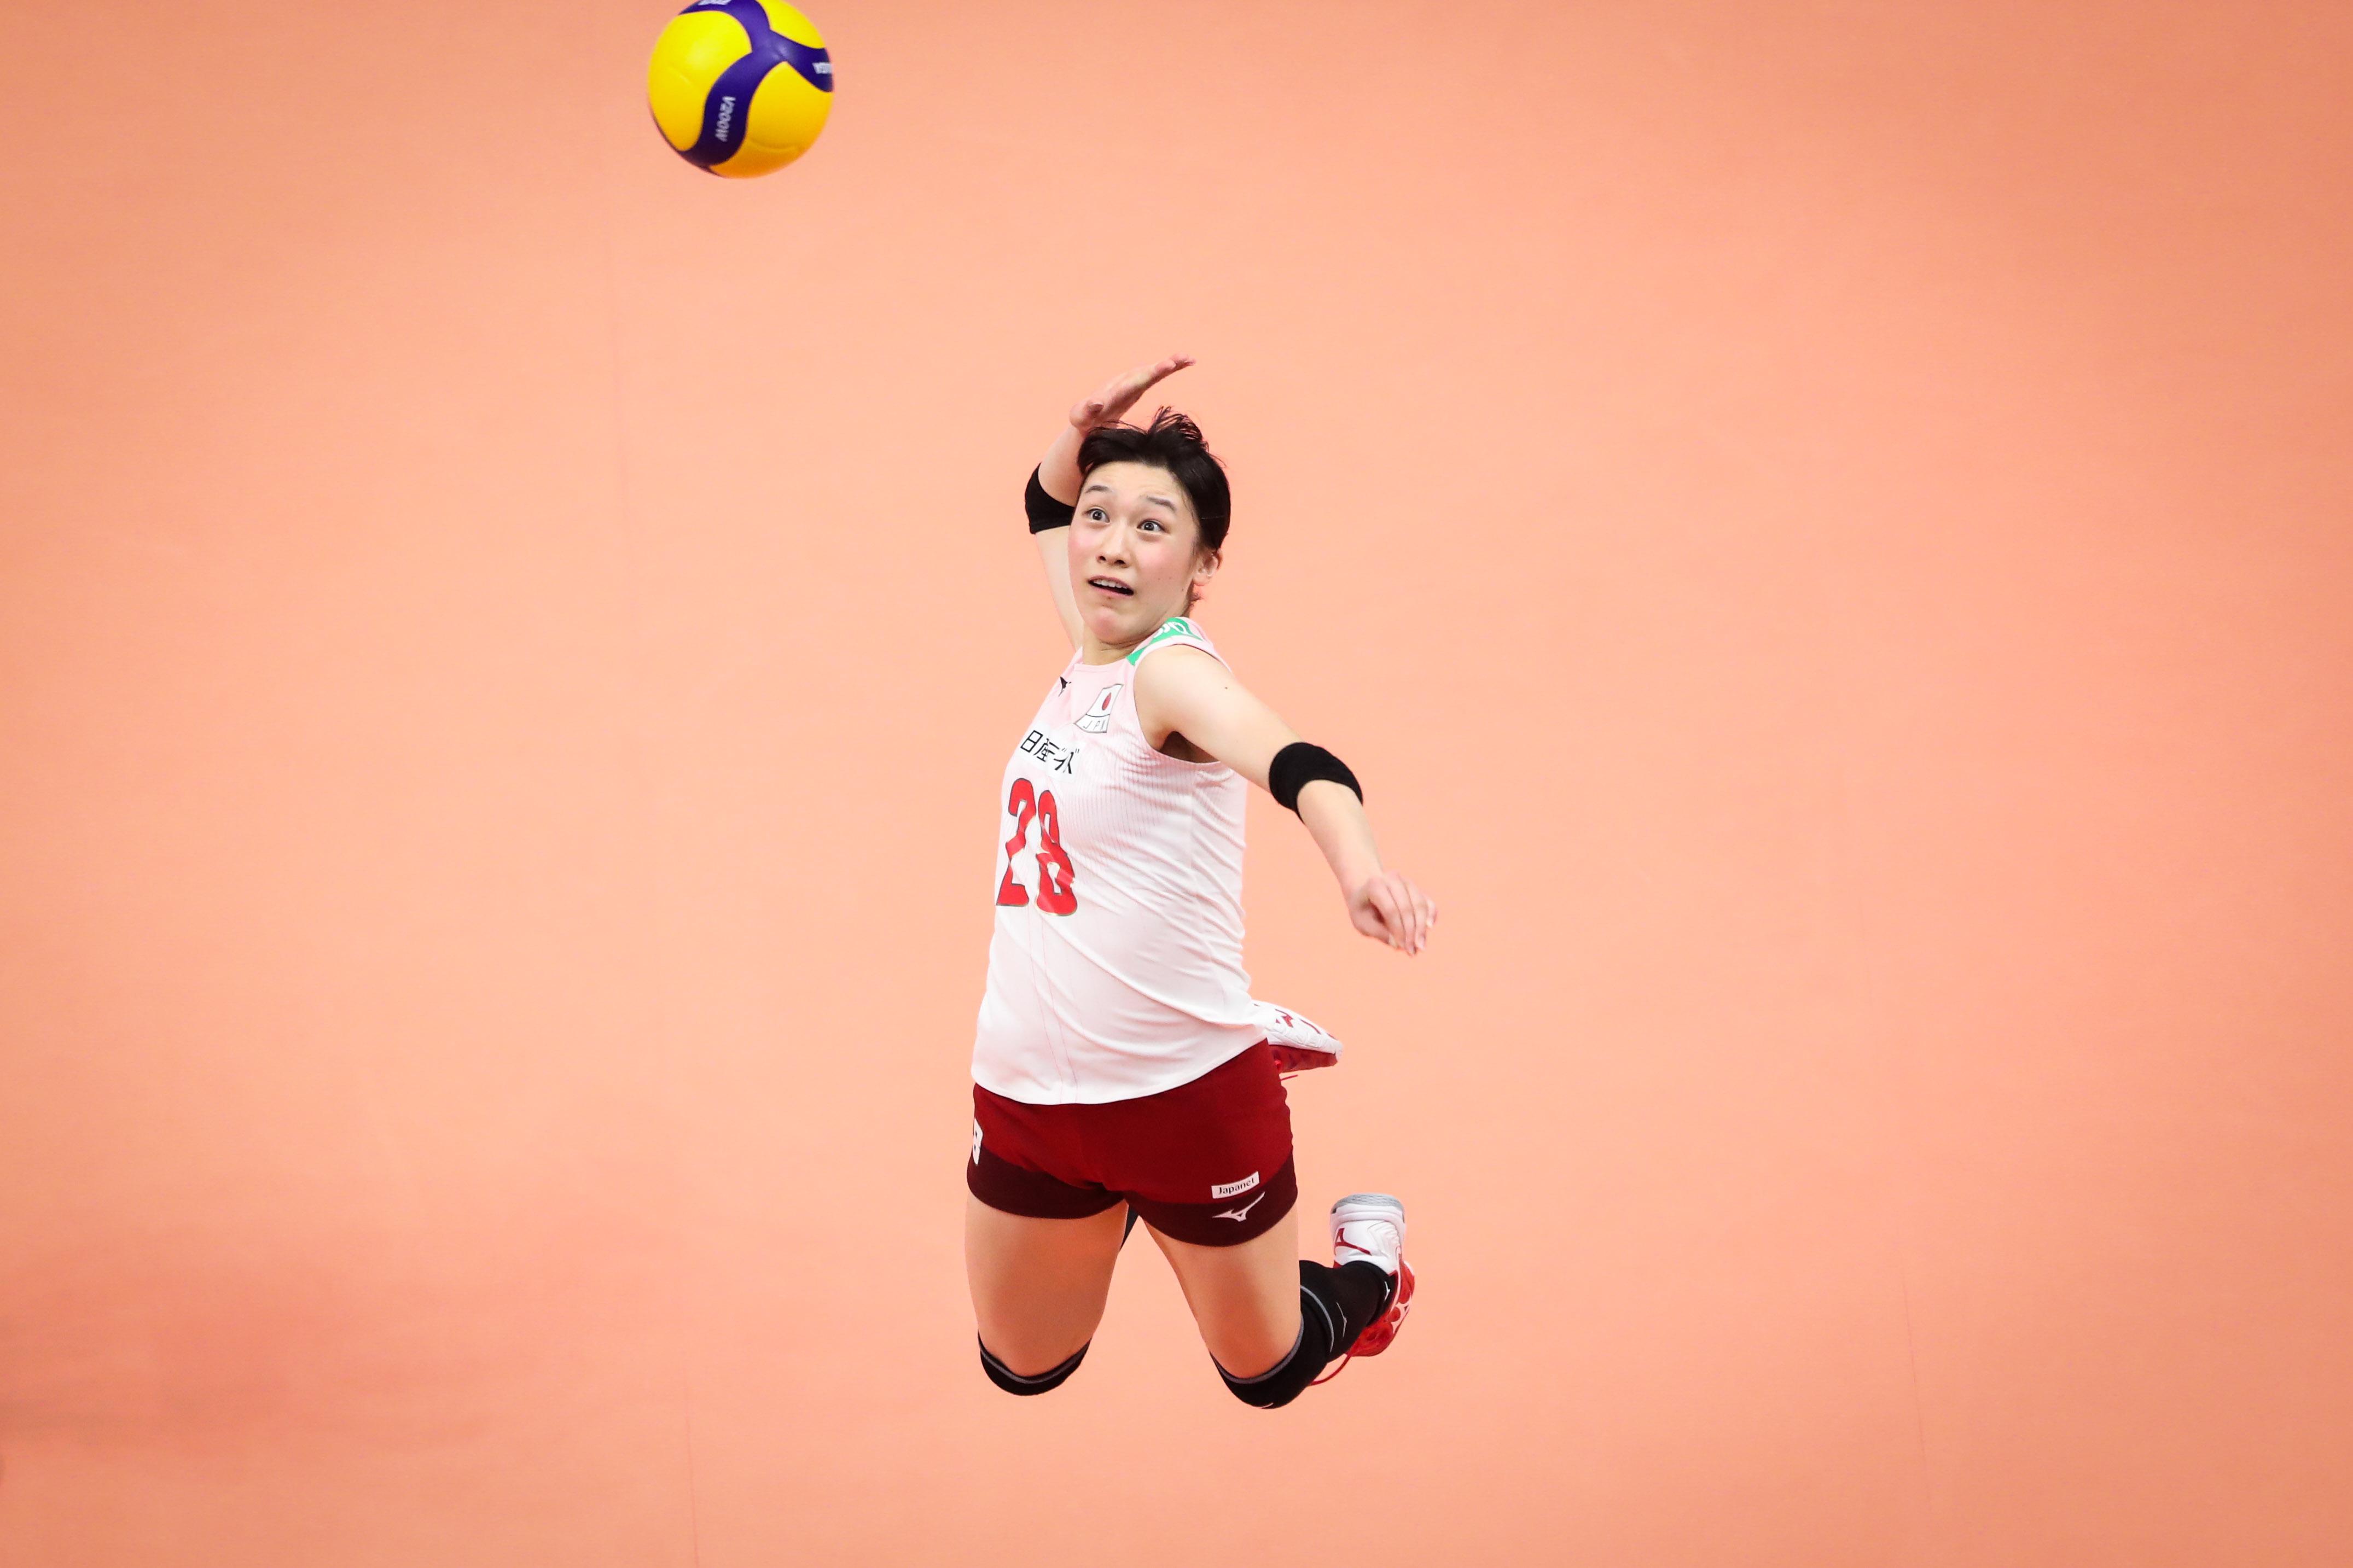 News detail - Rising star Mayu Ishikawa follows in her brother's footsteps